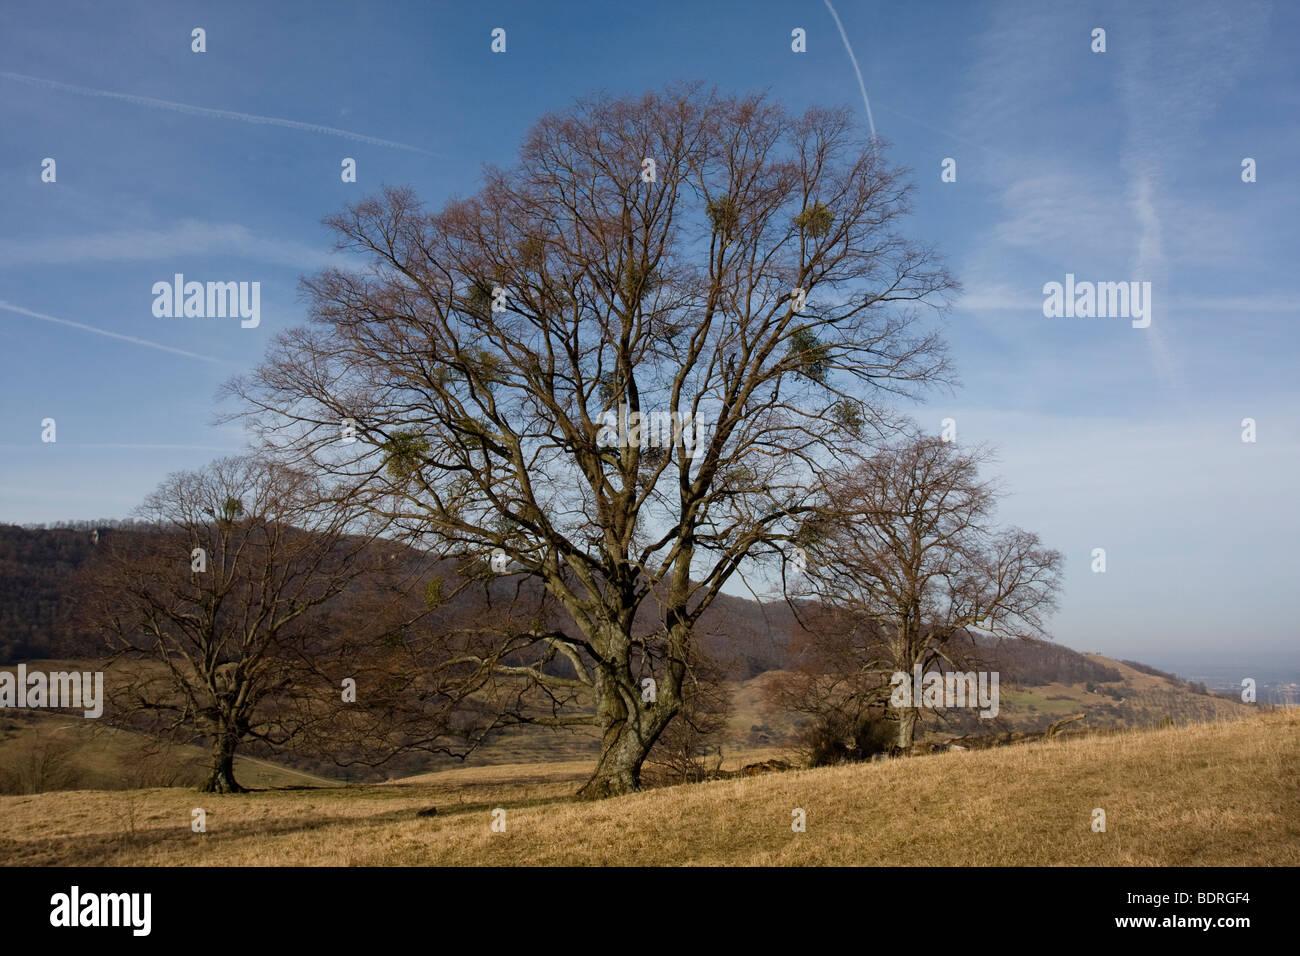 Baum, Baeume, Fruehling, Teck, sch.ools.it Alb, Deutschland, Baum, Bäume, Frühling, Deutschland Stockbild